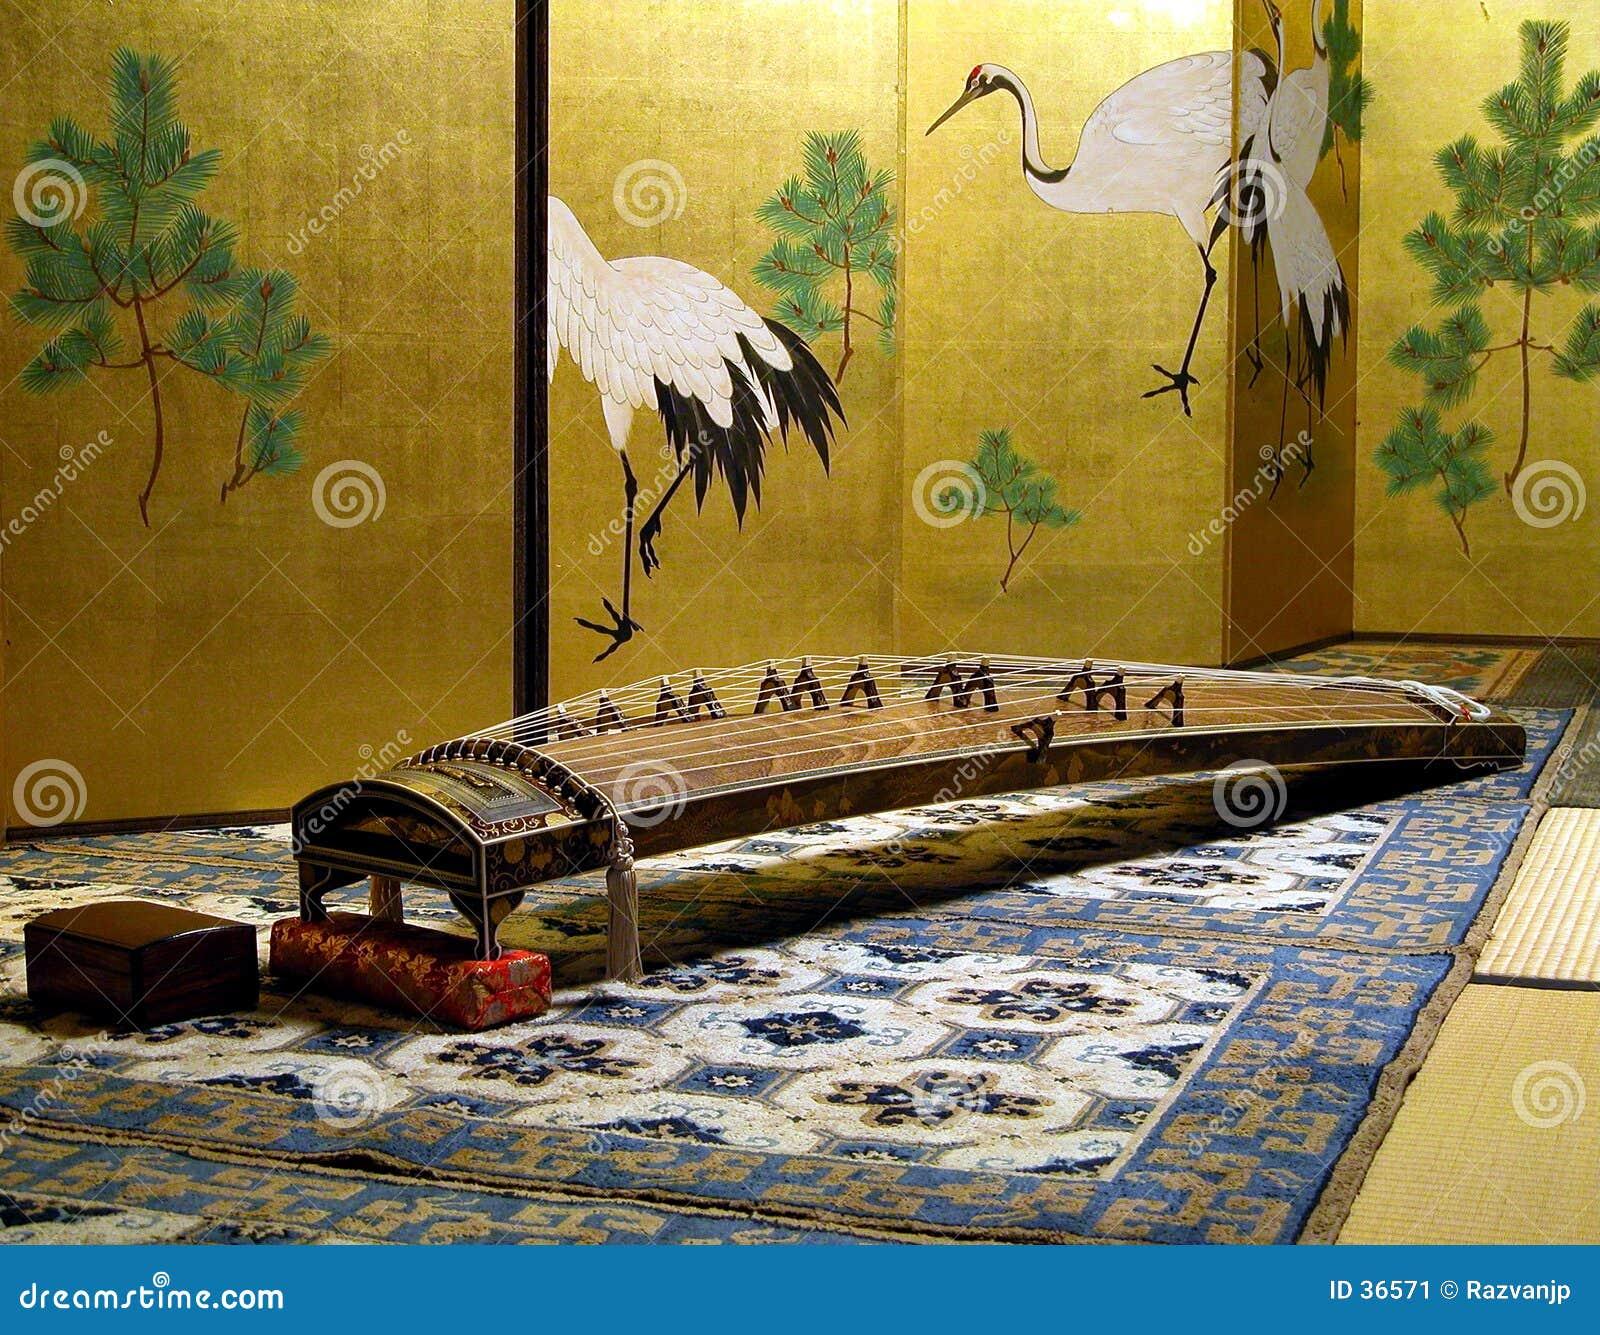 Download Kato imagen de archivo. Imagen de musical, casa, japón, turco - 36571